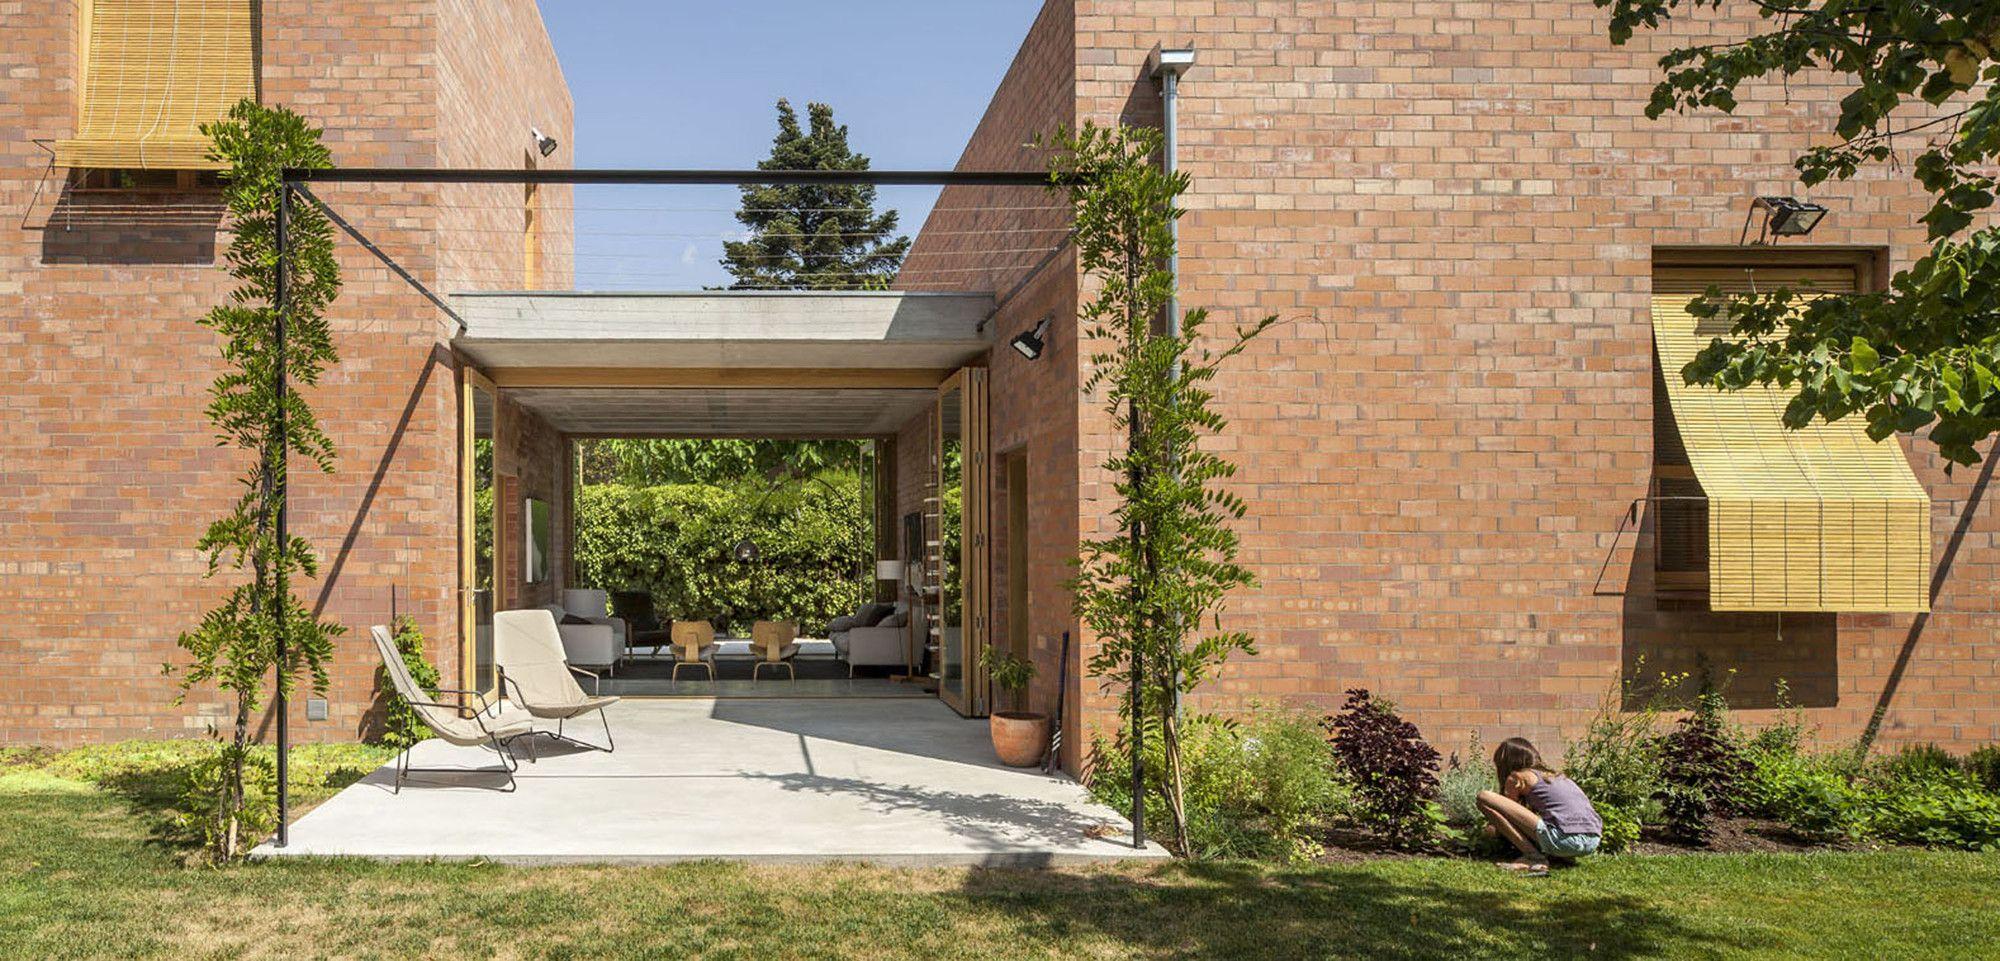 Gallery - House 1101 / H Arquitectes - 8